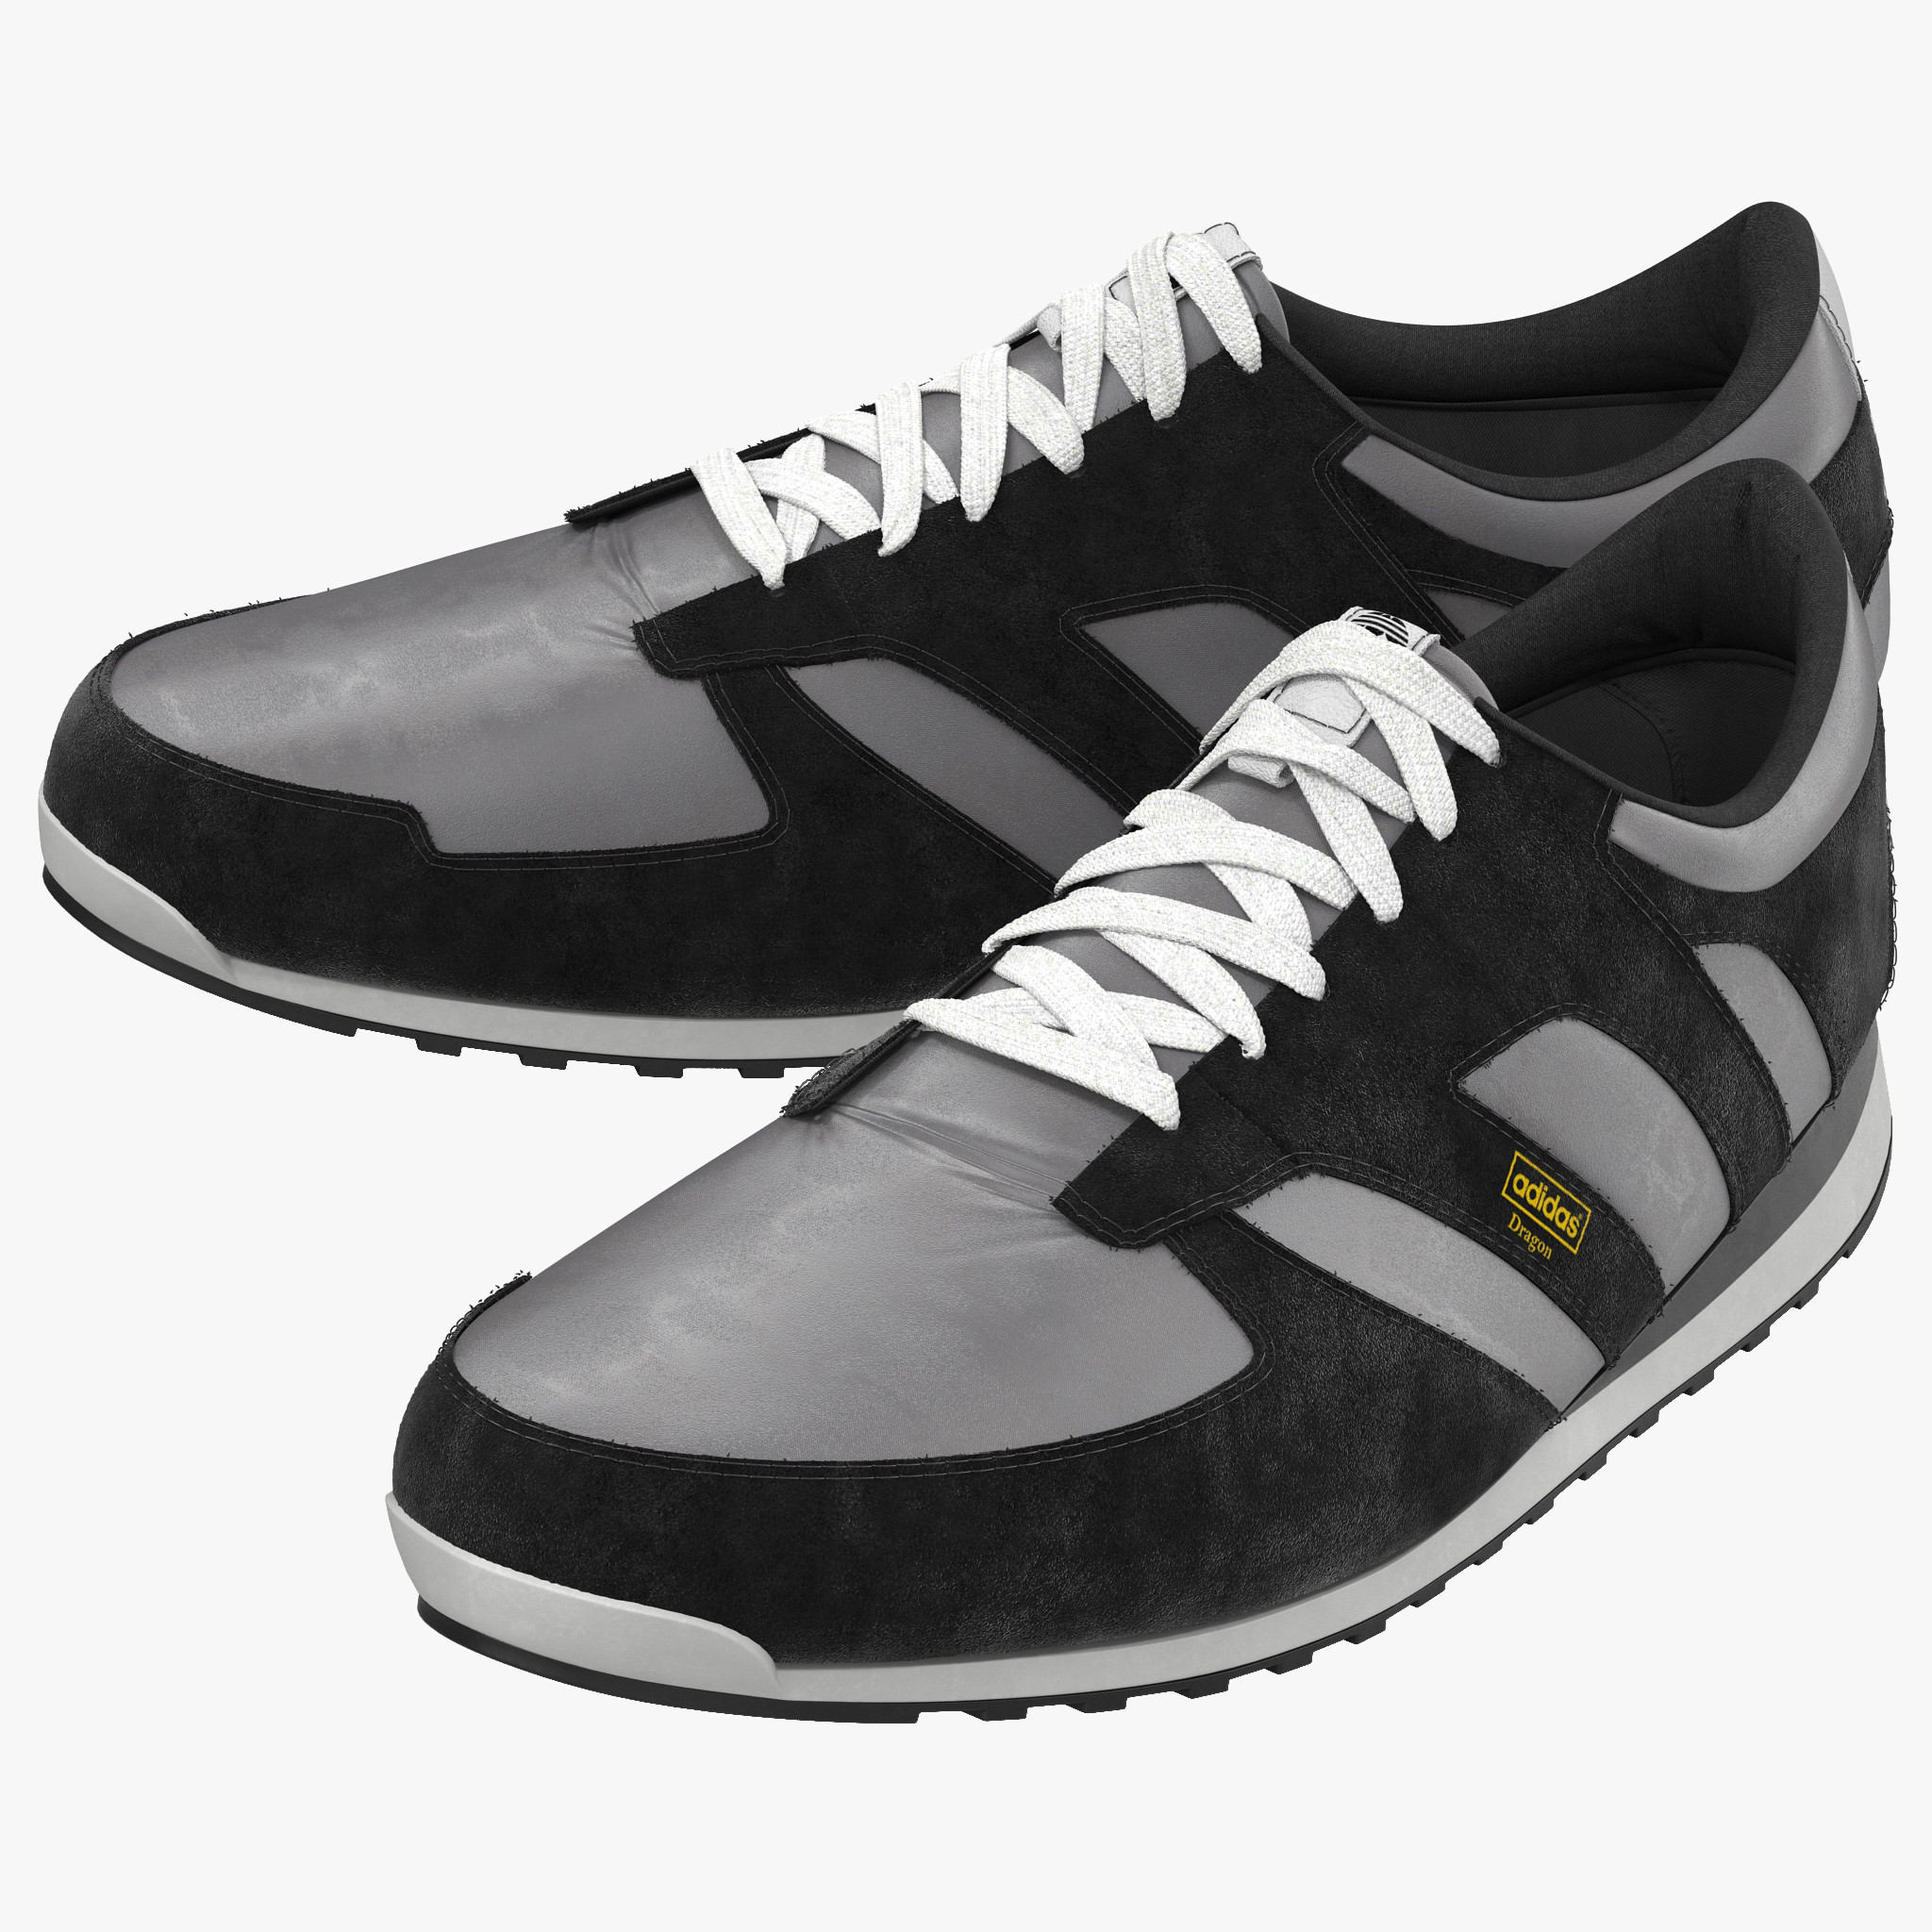 adidas shoes models